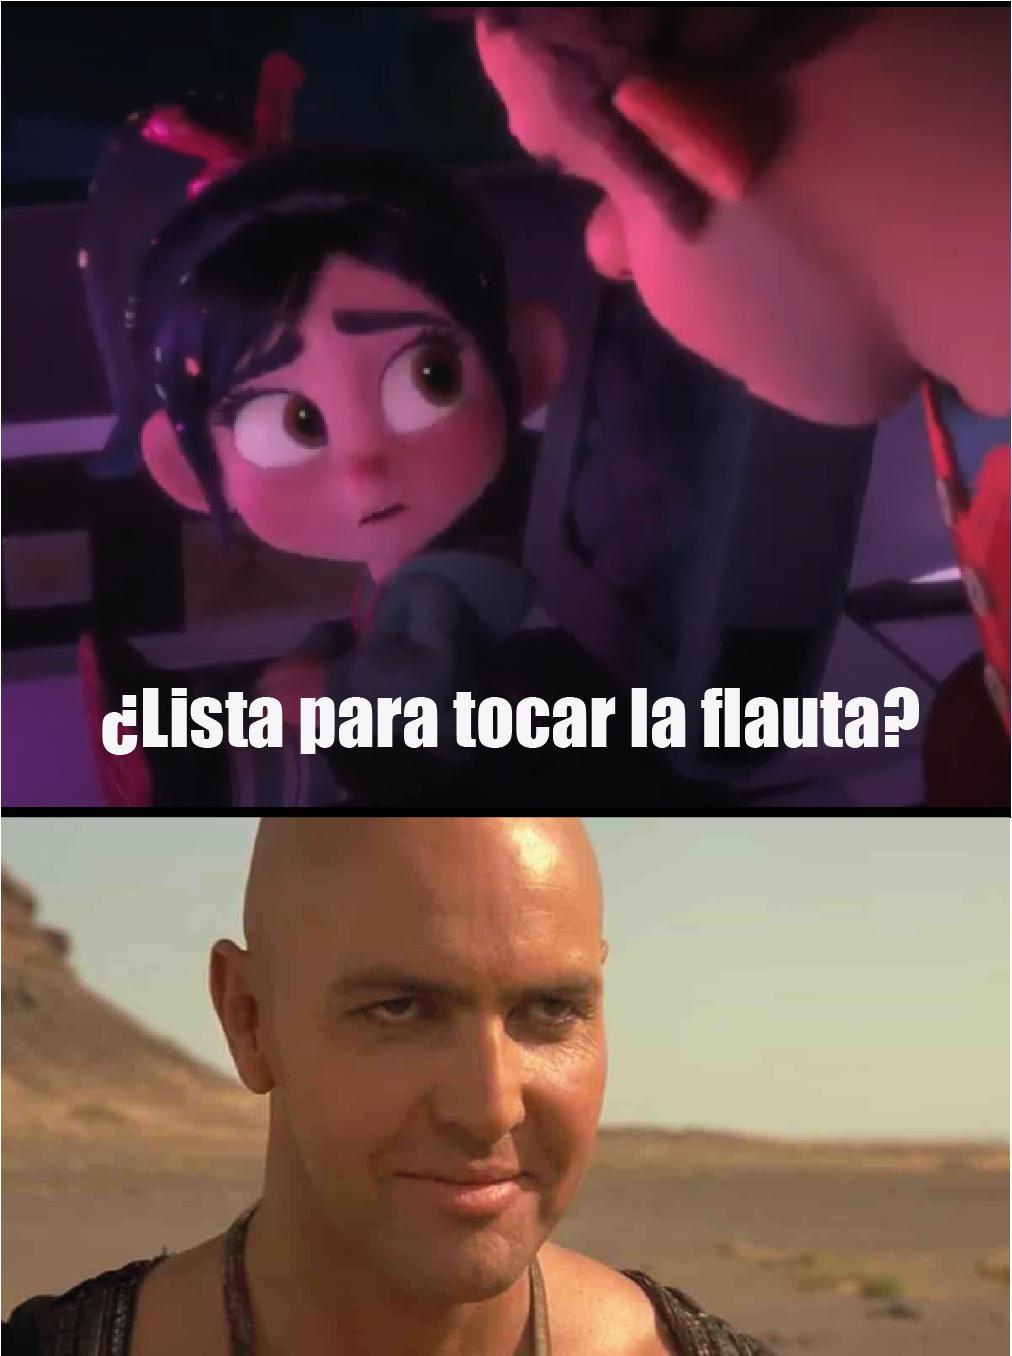 La flauta-RalphElDemoledor - meme